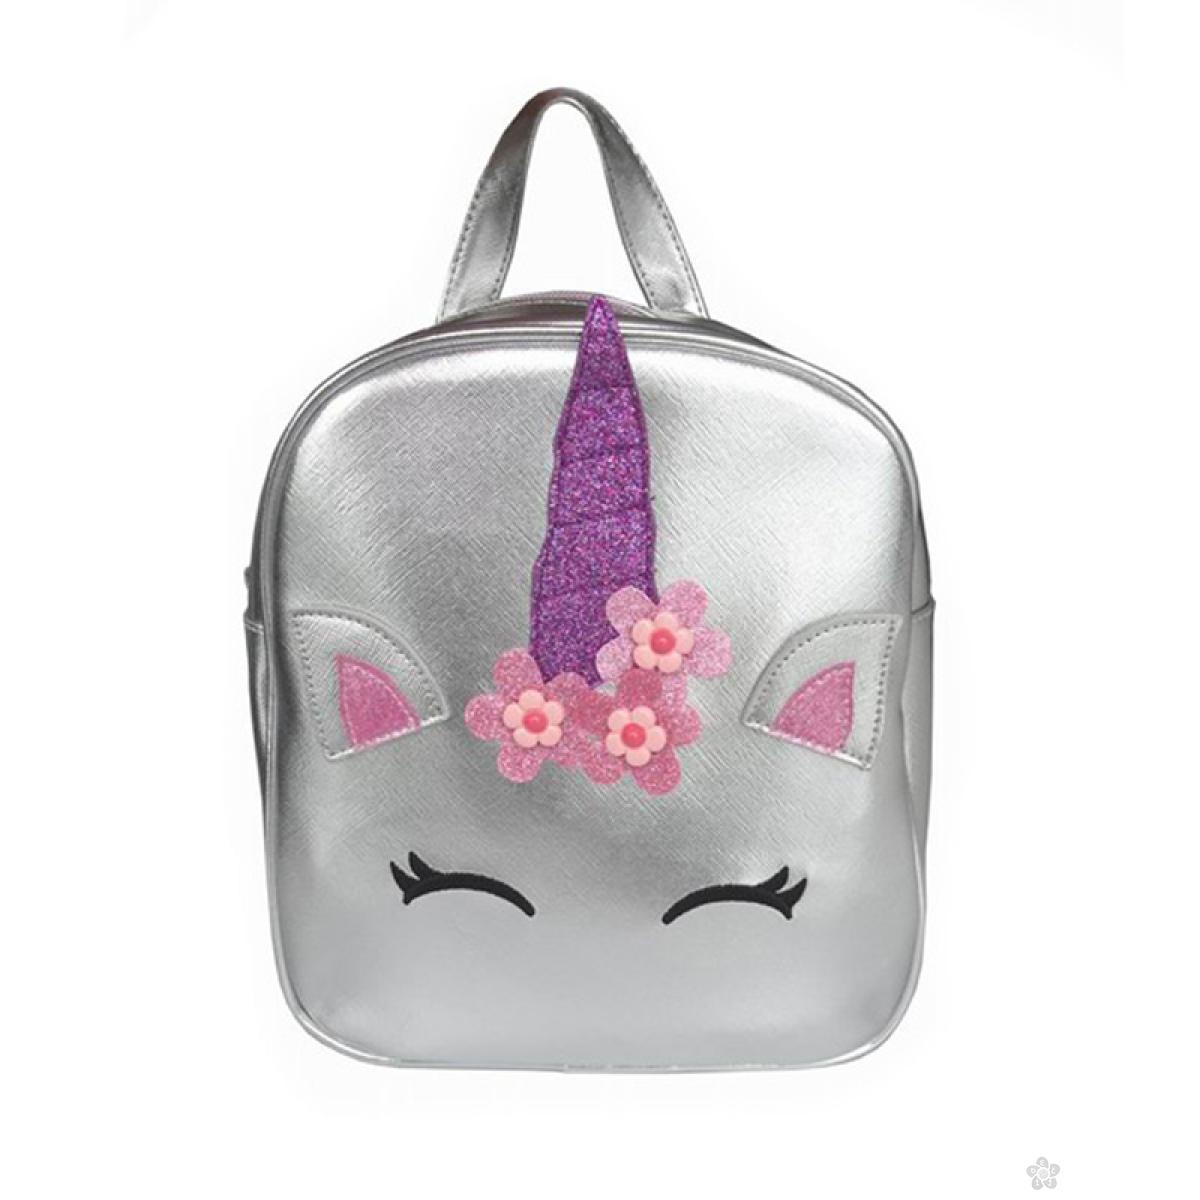 Rančić Sazio Lolly Unicorn 100807